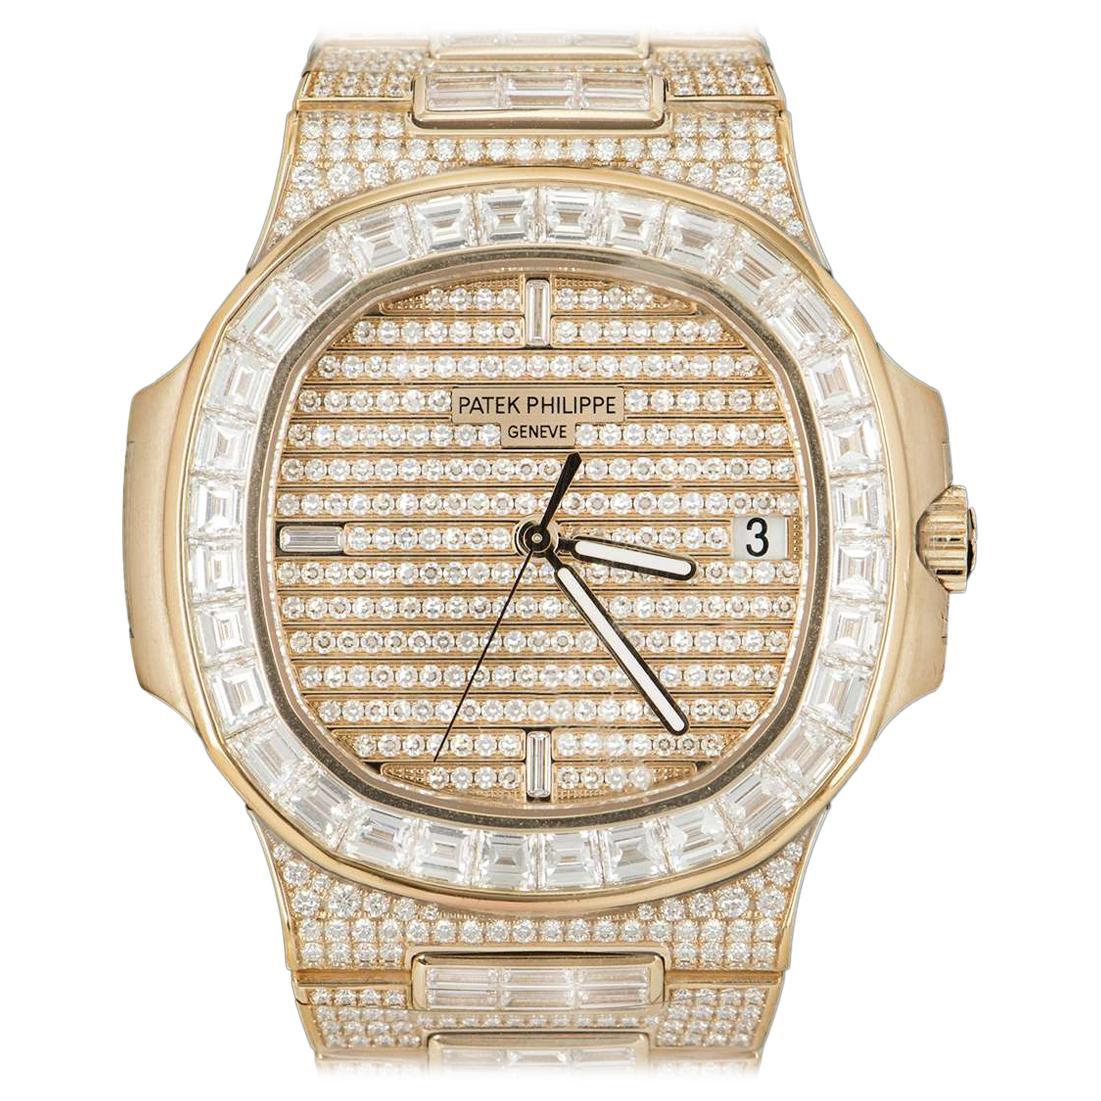 Rare Patek Philippe Nautilus Fully Loaded Rose Gold Diamond Set Automatic Watch